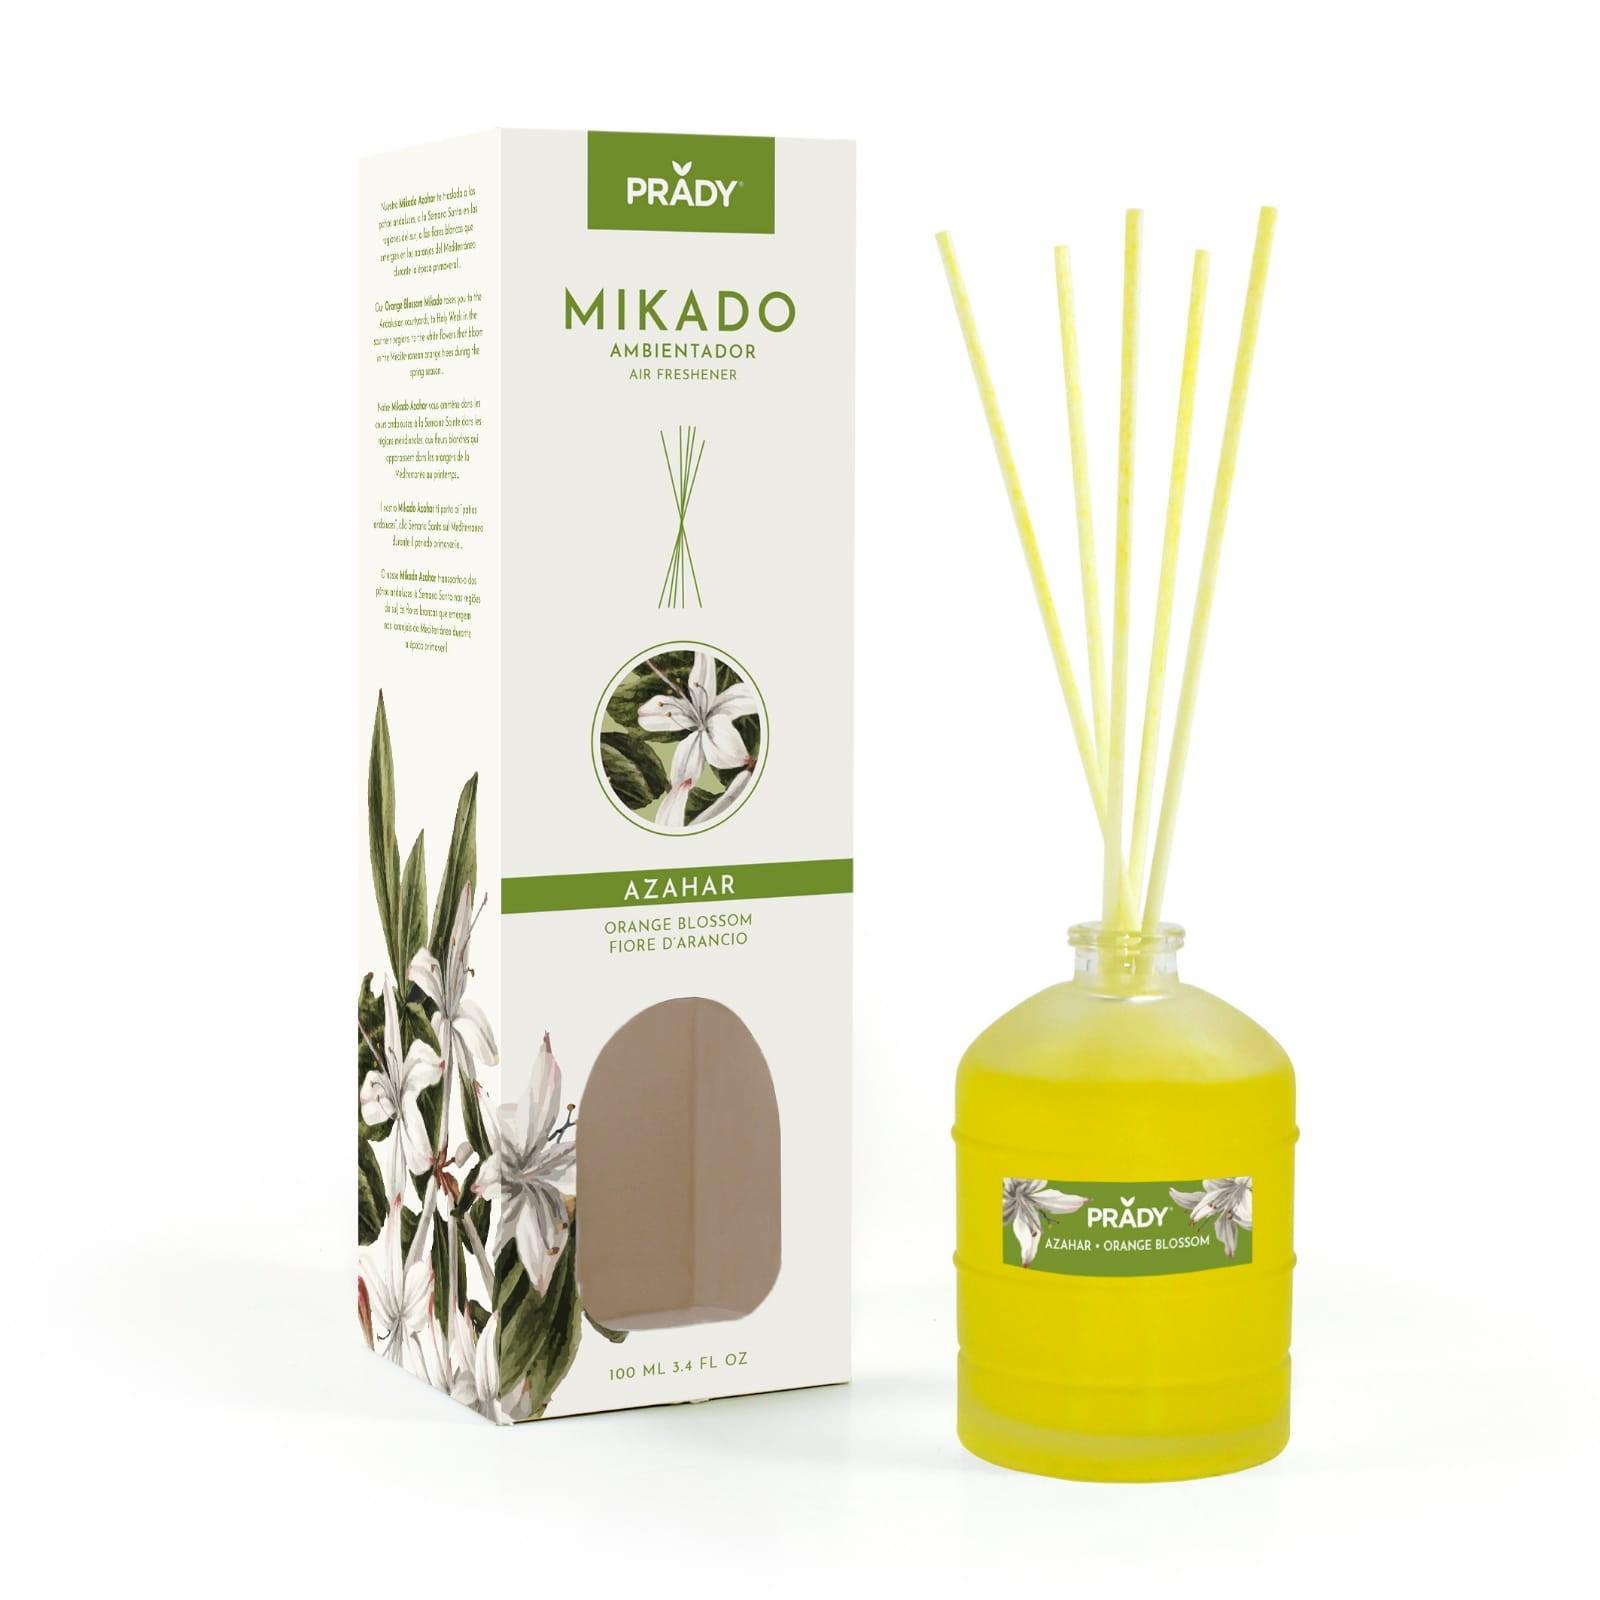 Ambientador Mikado Azahar 100 ml. Prady